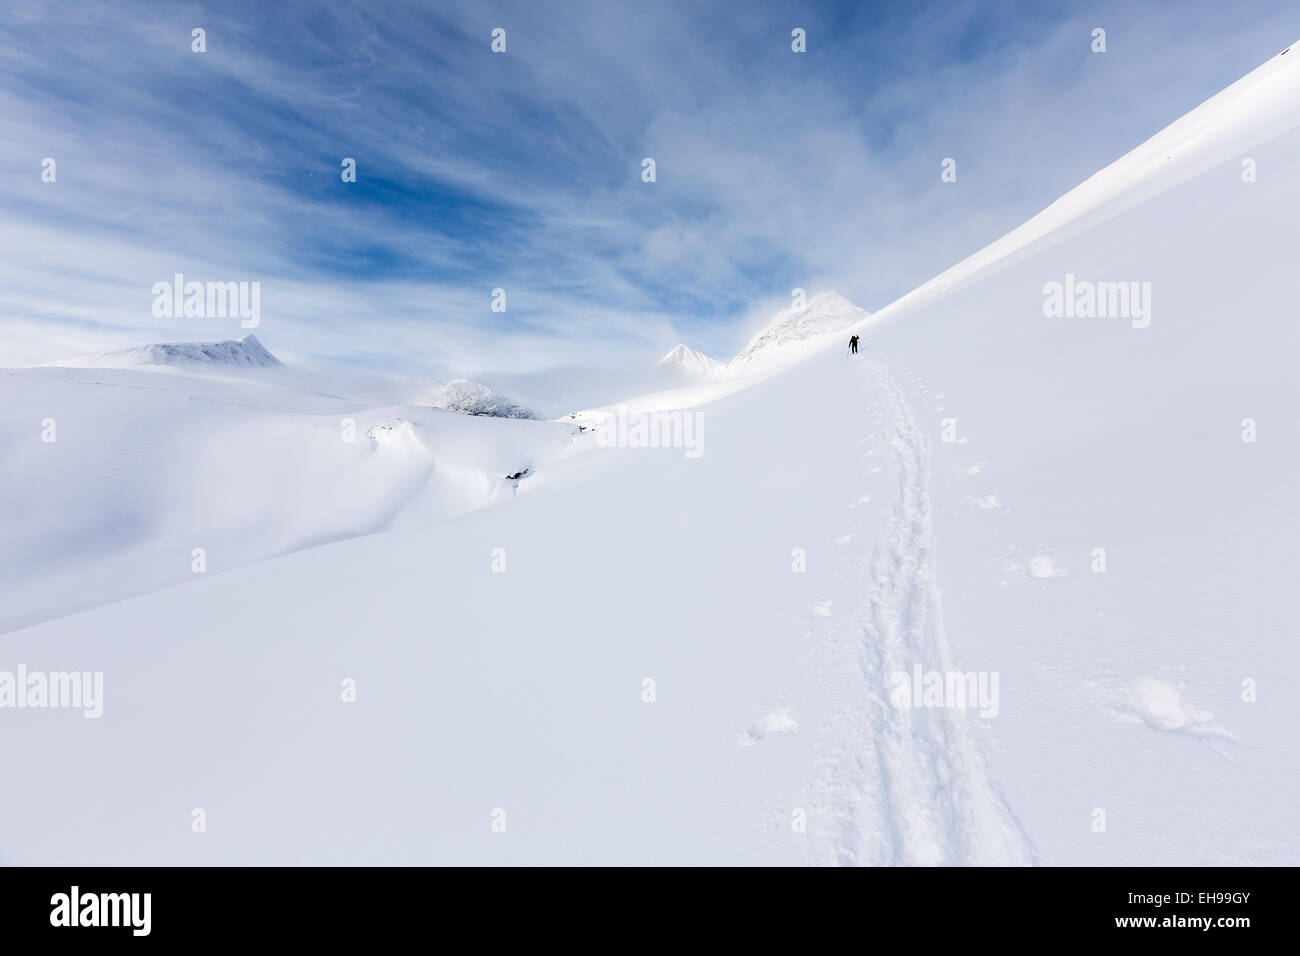 Starting the ascend from Nallostugan towards Nallo mountain, Kiruna, Sweden, Europe, EU - Stock Image